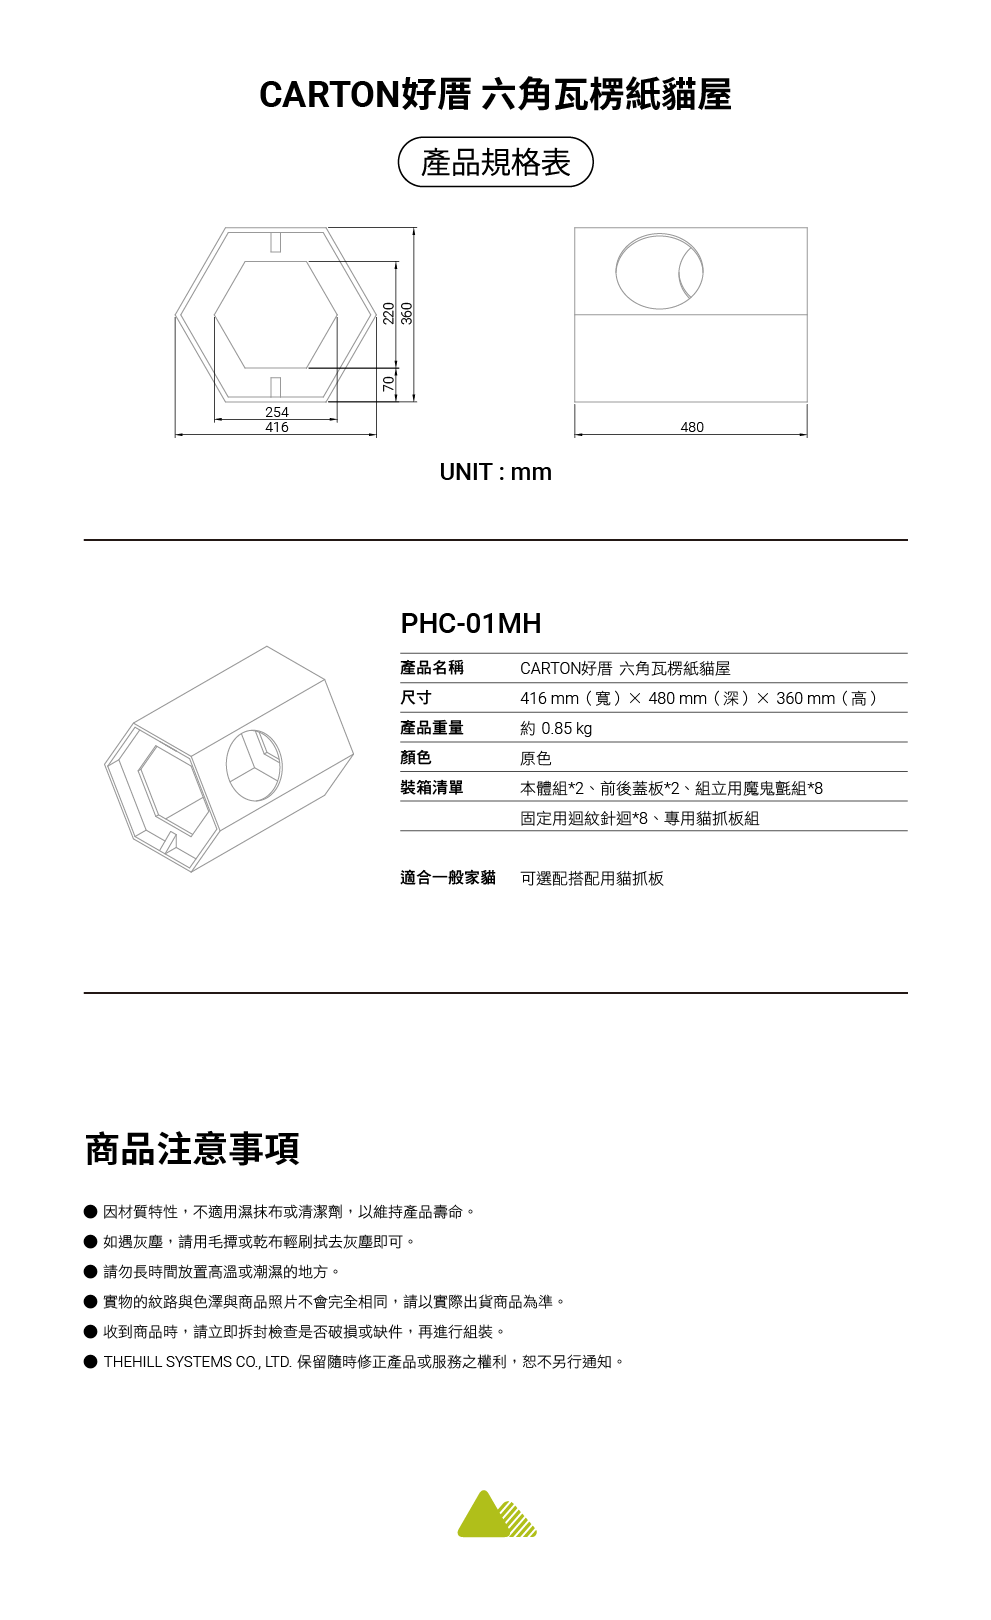 PHC-01MH (4).png